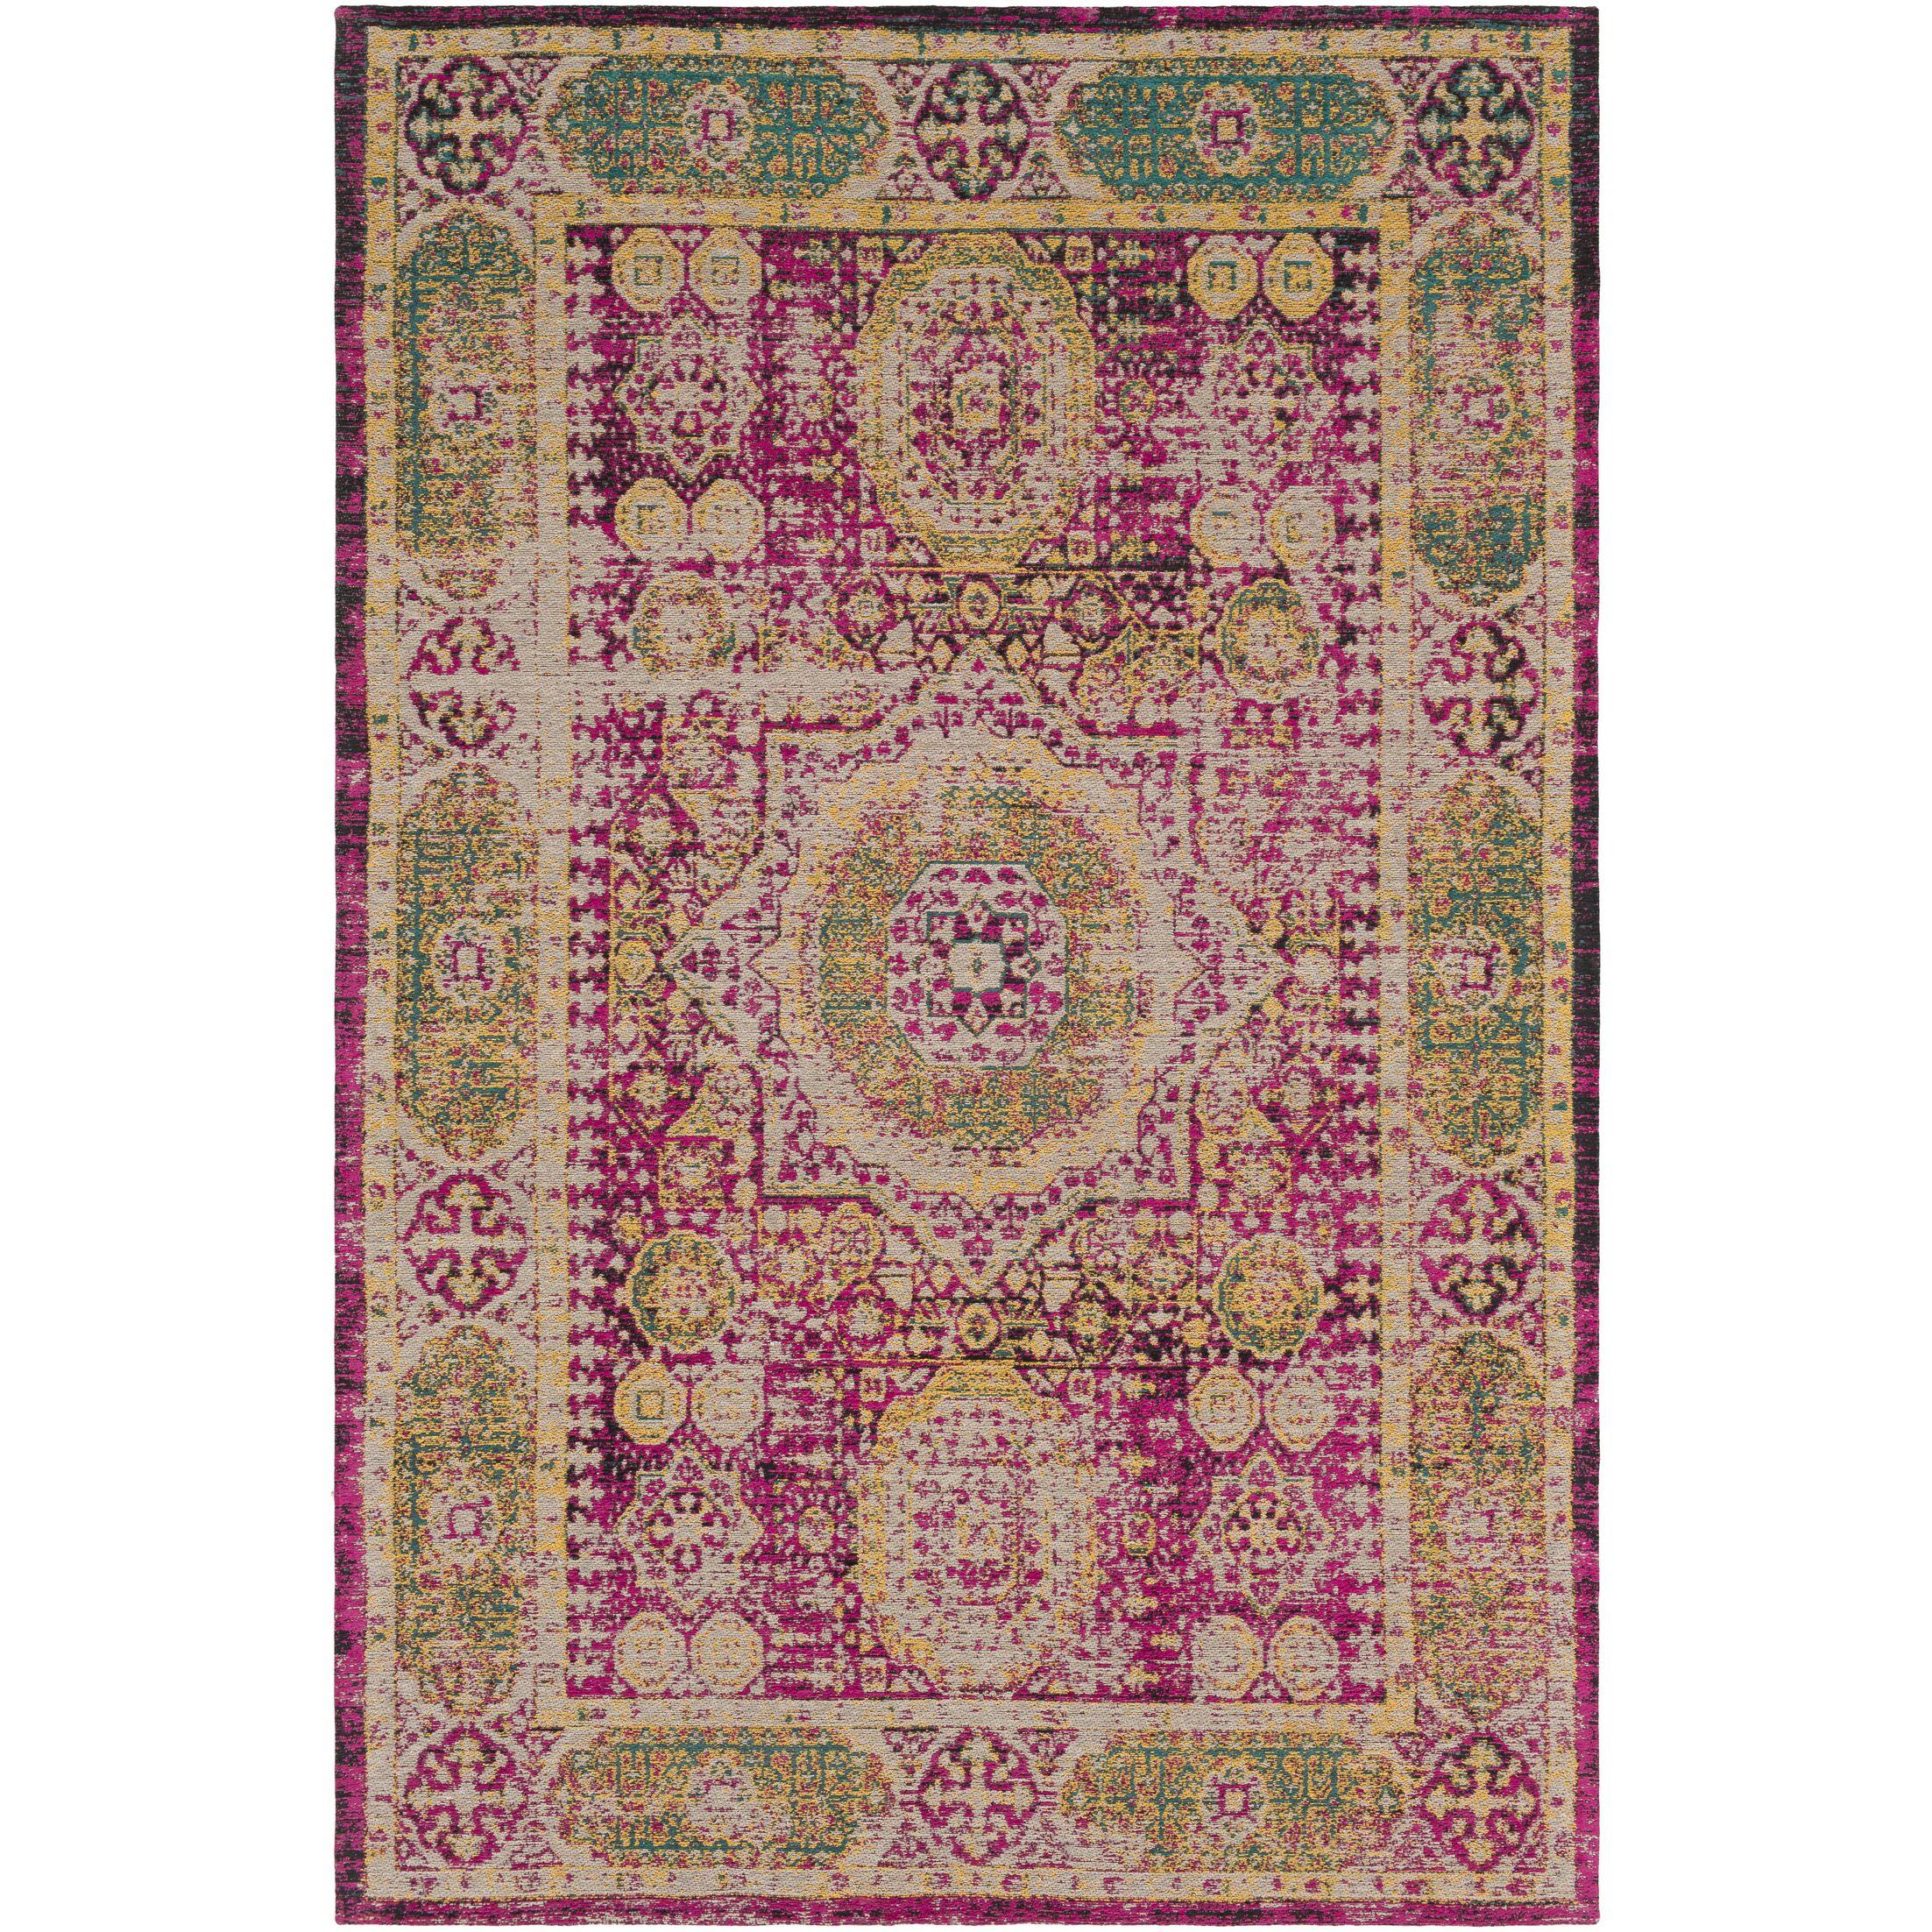 Hamza Hand-Woven Bright Pink/Saffron Area Rug Rug Size: Rectangle 8' x 10'